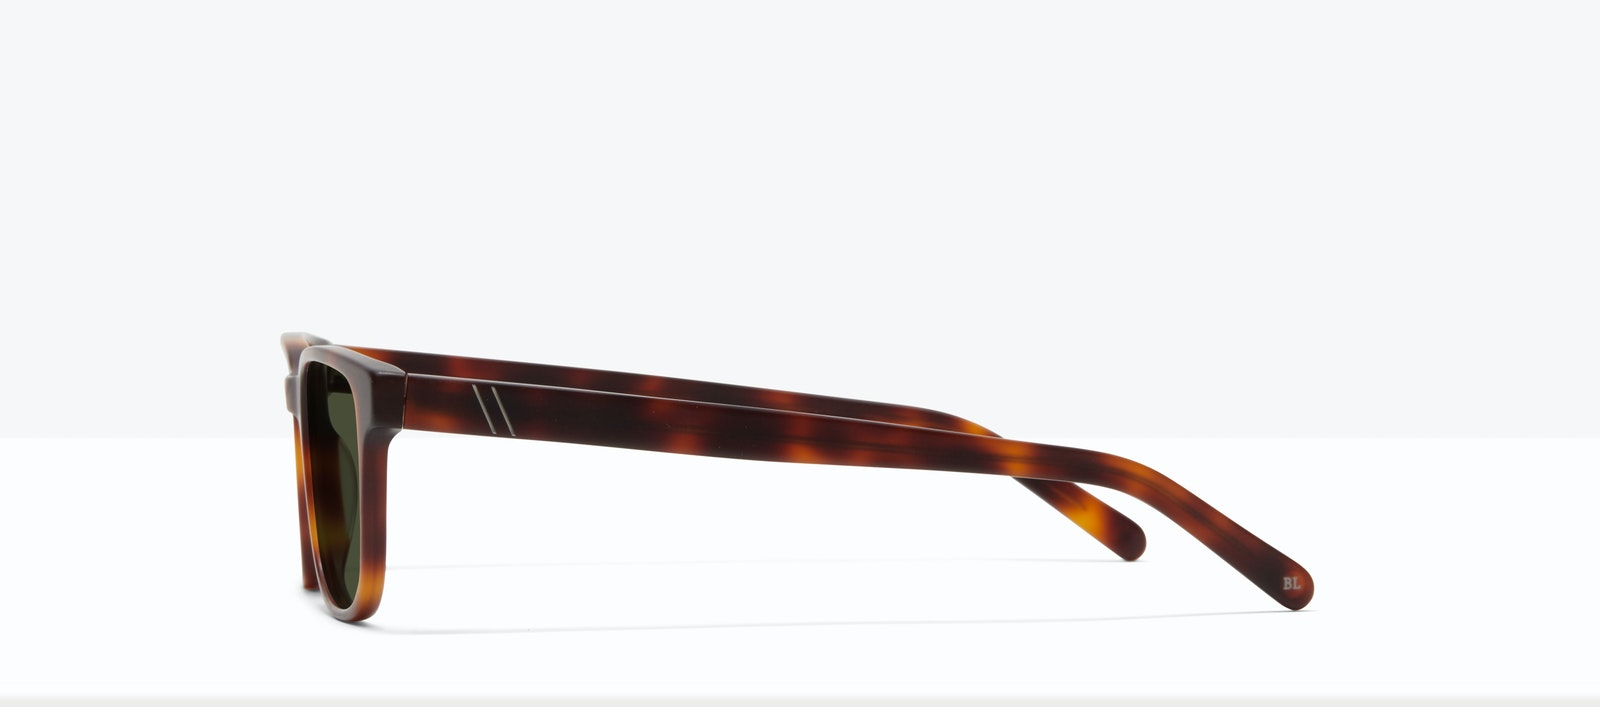 Affordable Fashion Glasses Square Sunglasses Men Role L Matte Tort Side